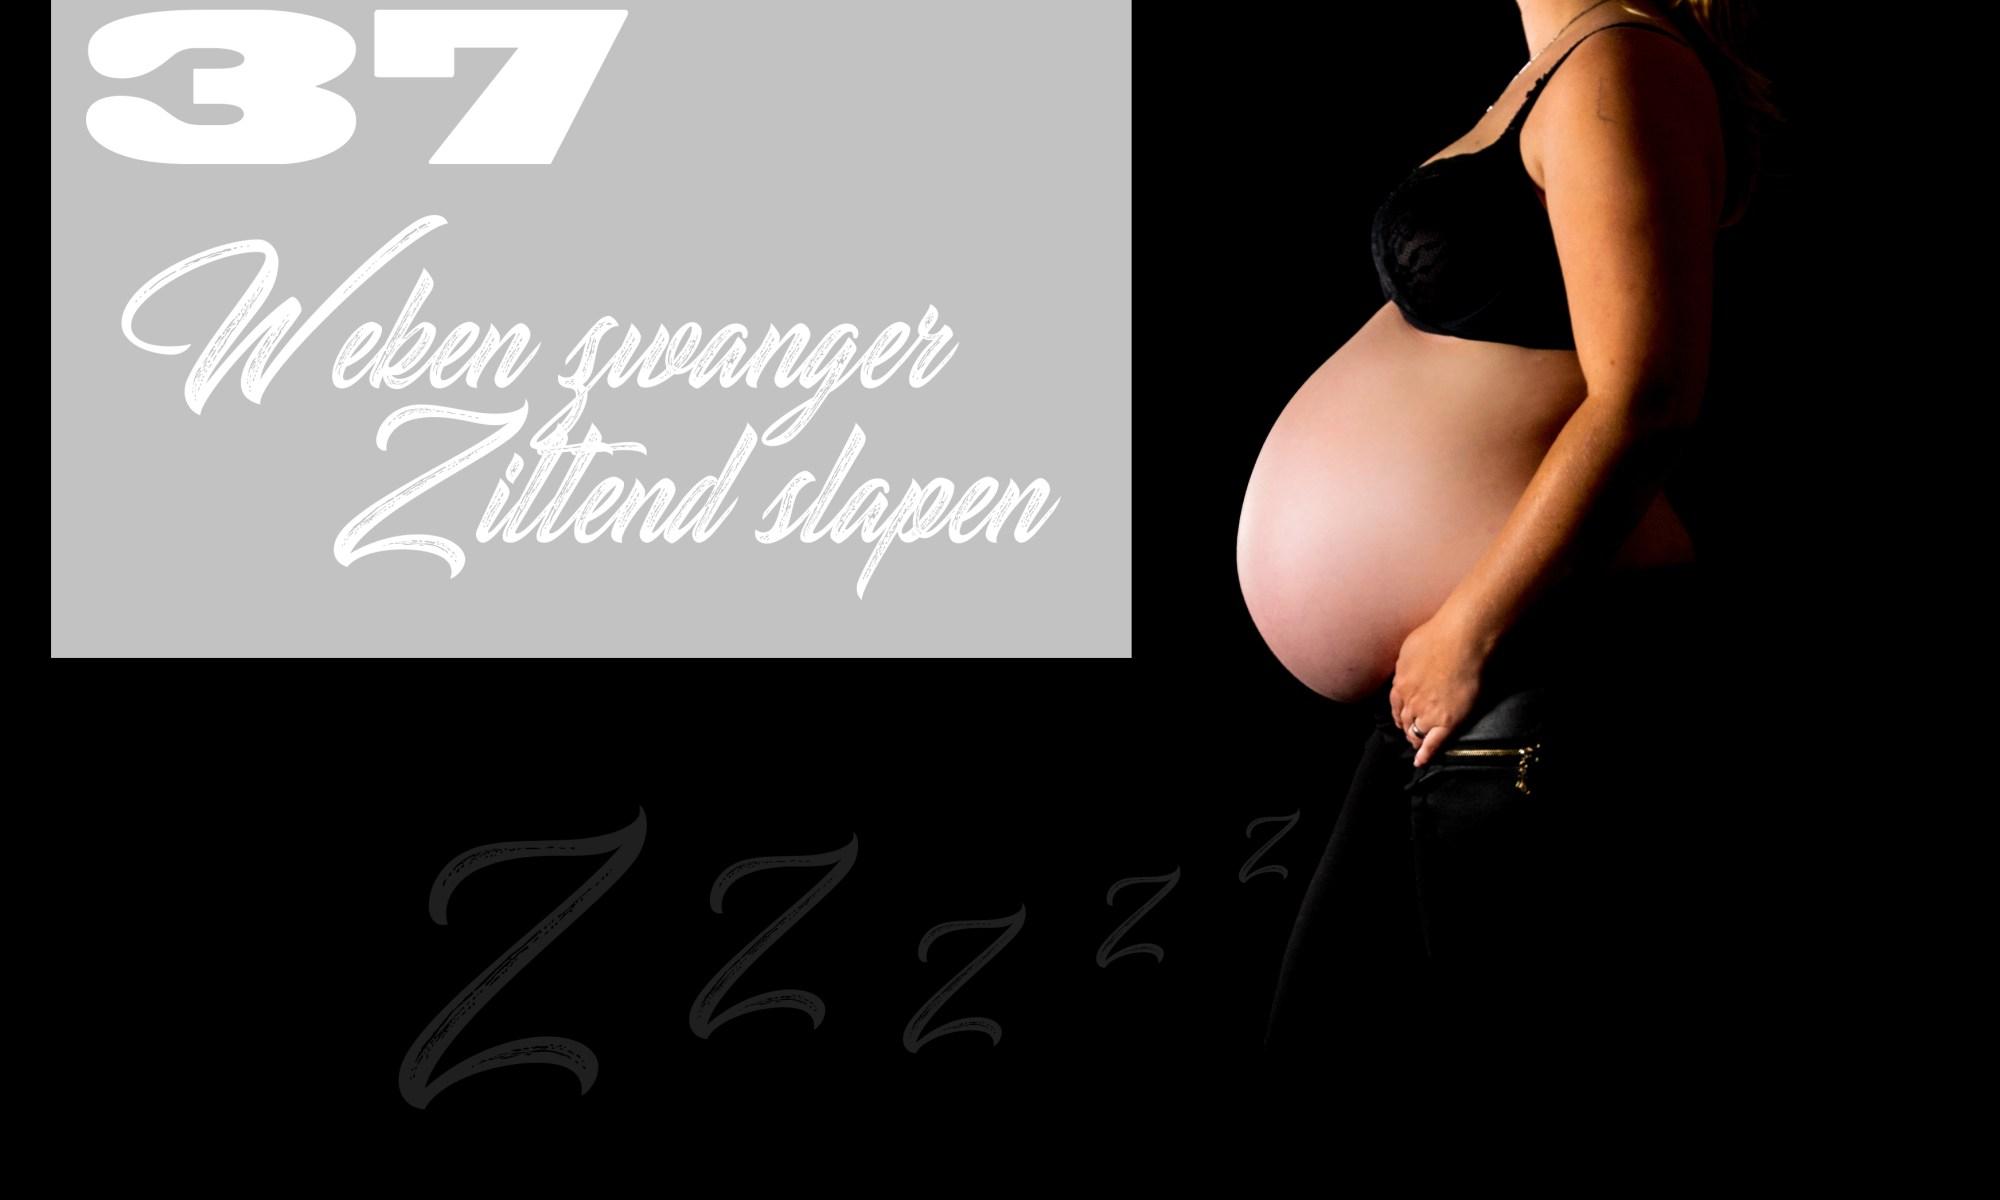 37 weken zwanger buikfoto bekken pijn slapen zittend bovenbenen kramp verloskundige controle hartje kwaaltjes strippen mama blog www.liefkleinwonder.nl